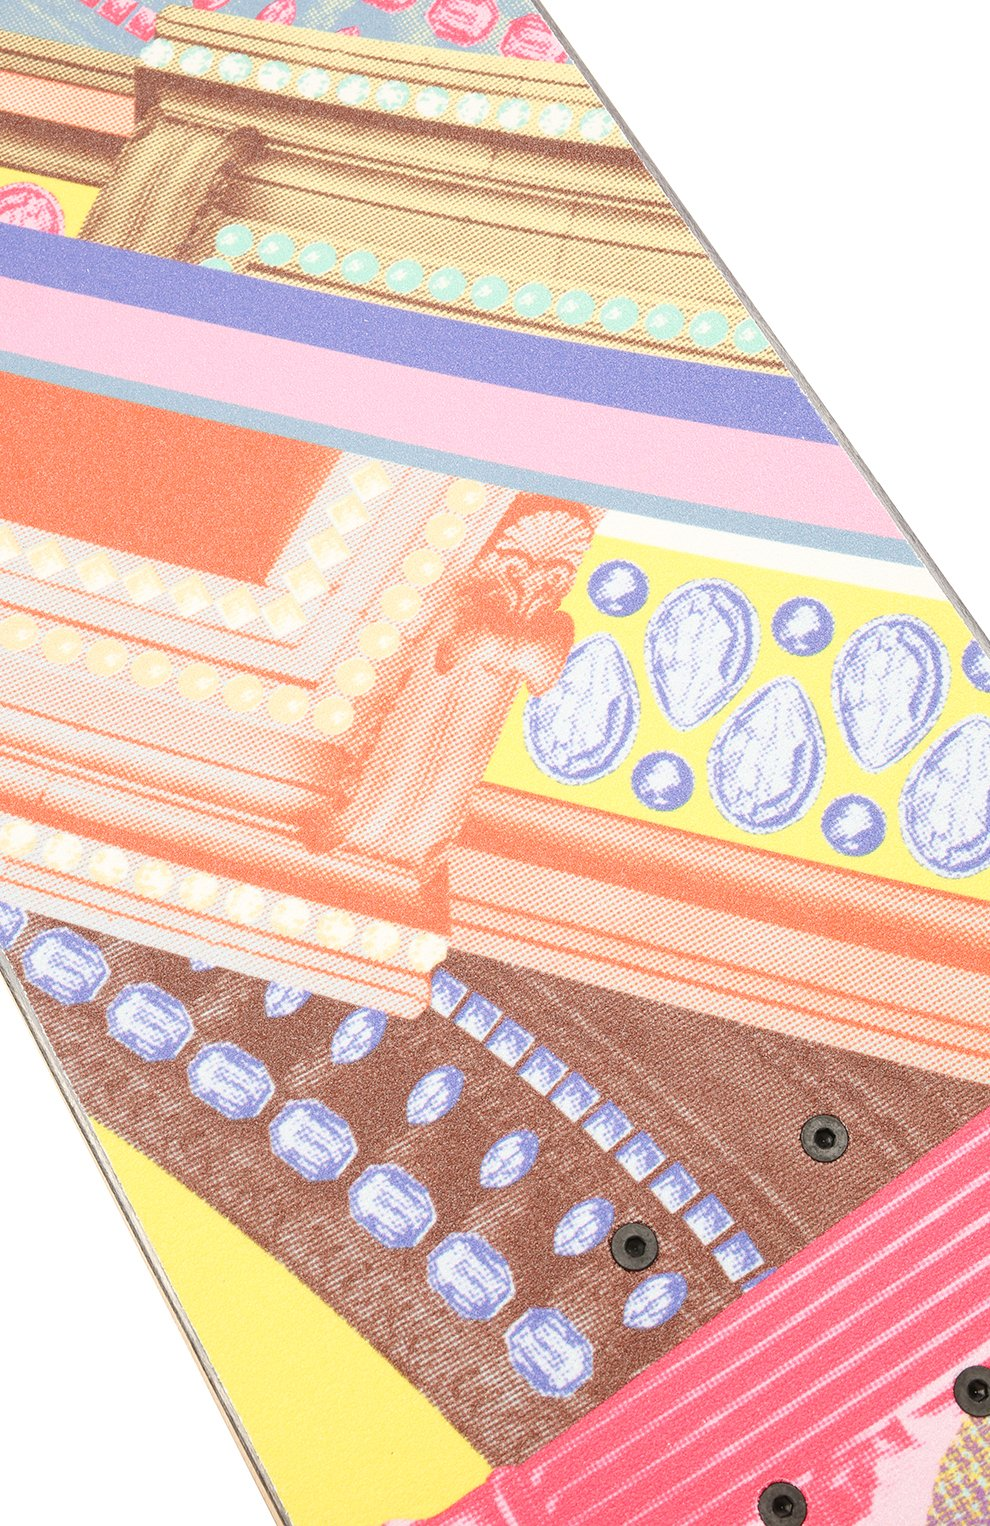 Детского скейтборд VERSACE разноцветного цвета, арт. ZSKATE001/ZW00D001 | Фото 5 (Материал: Дерево)